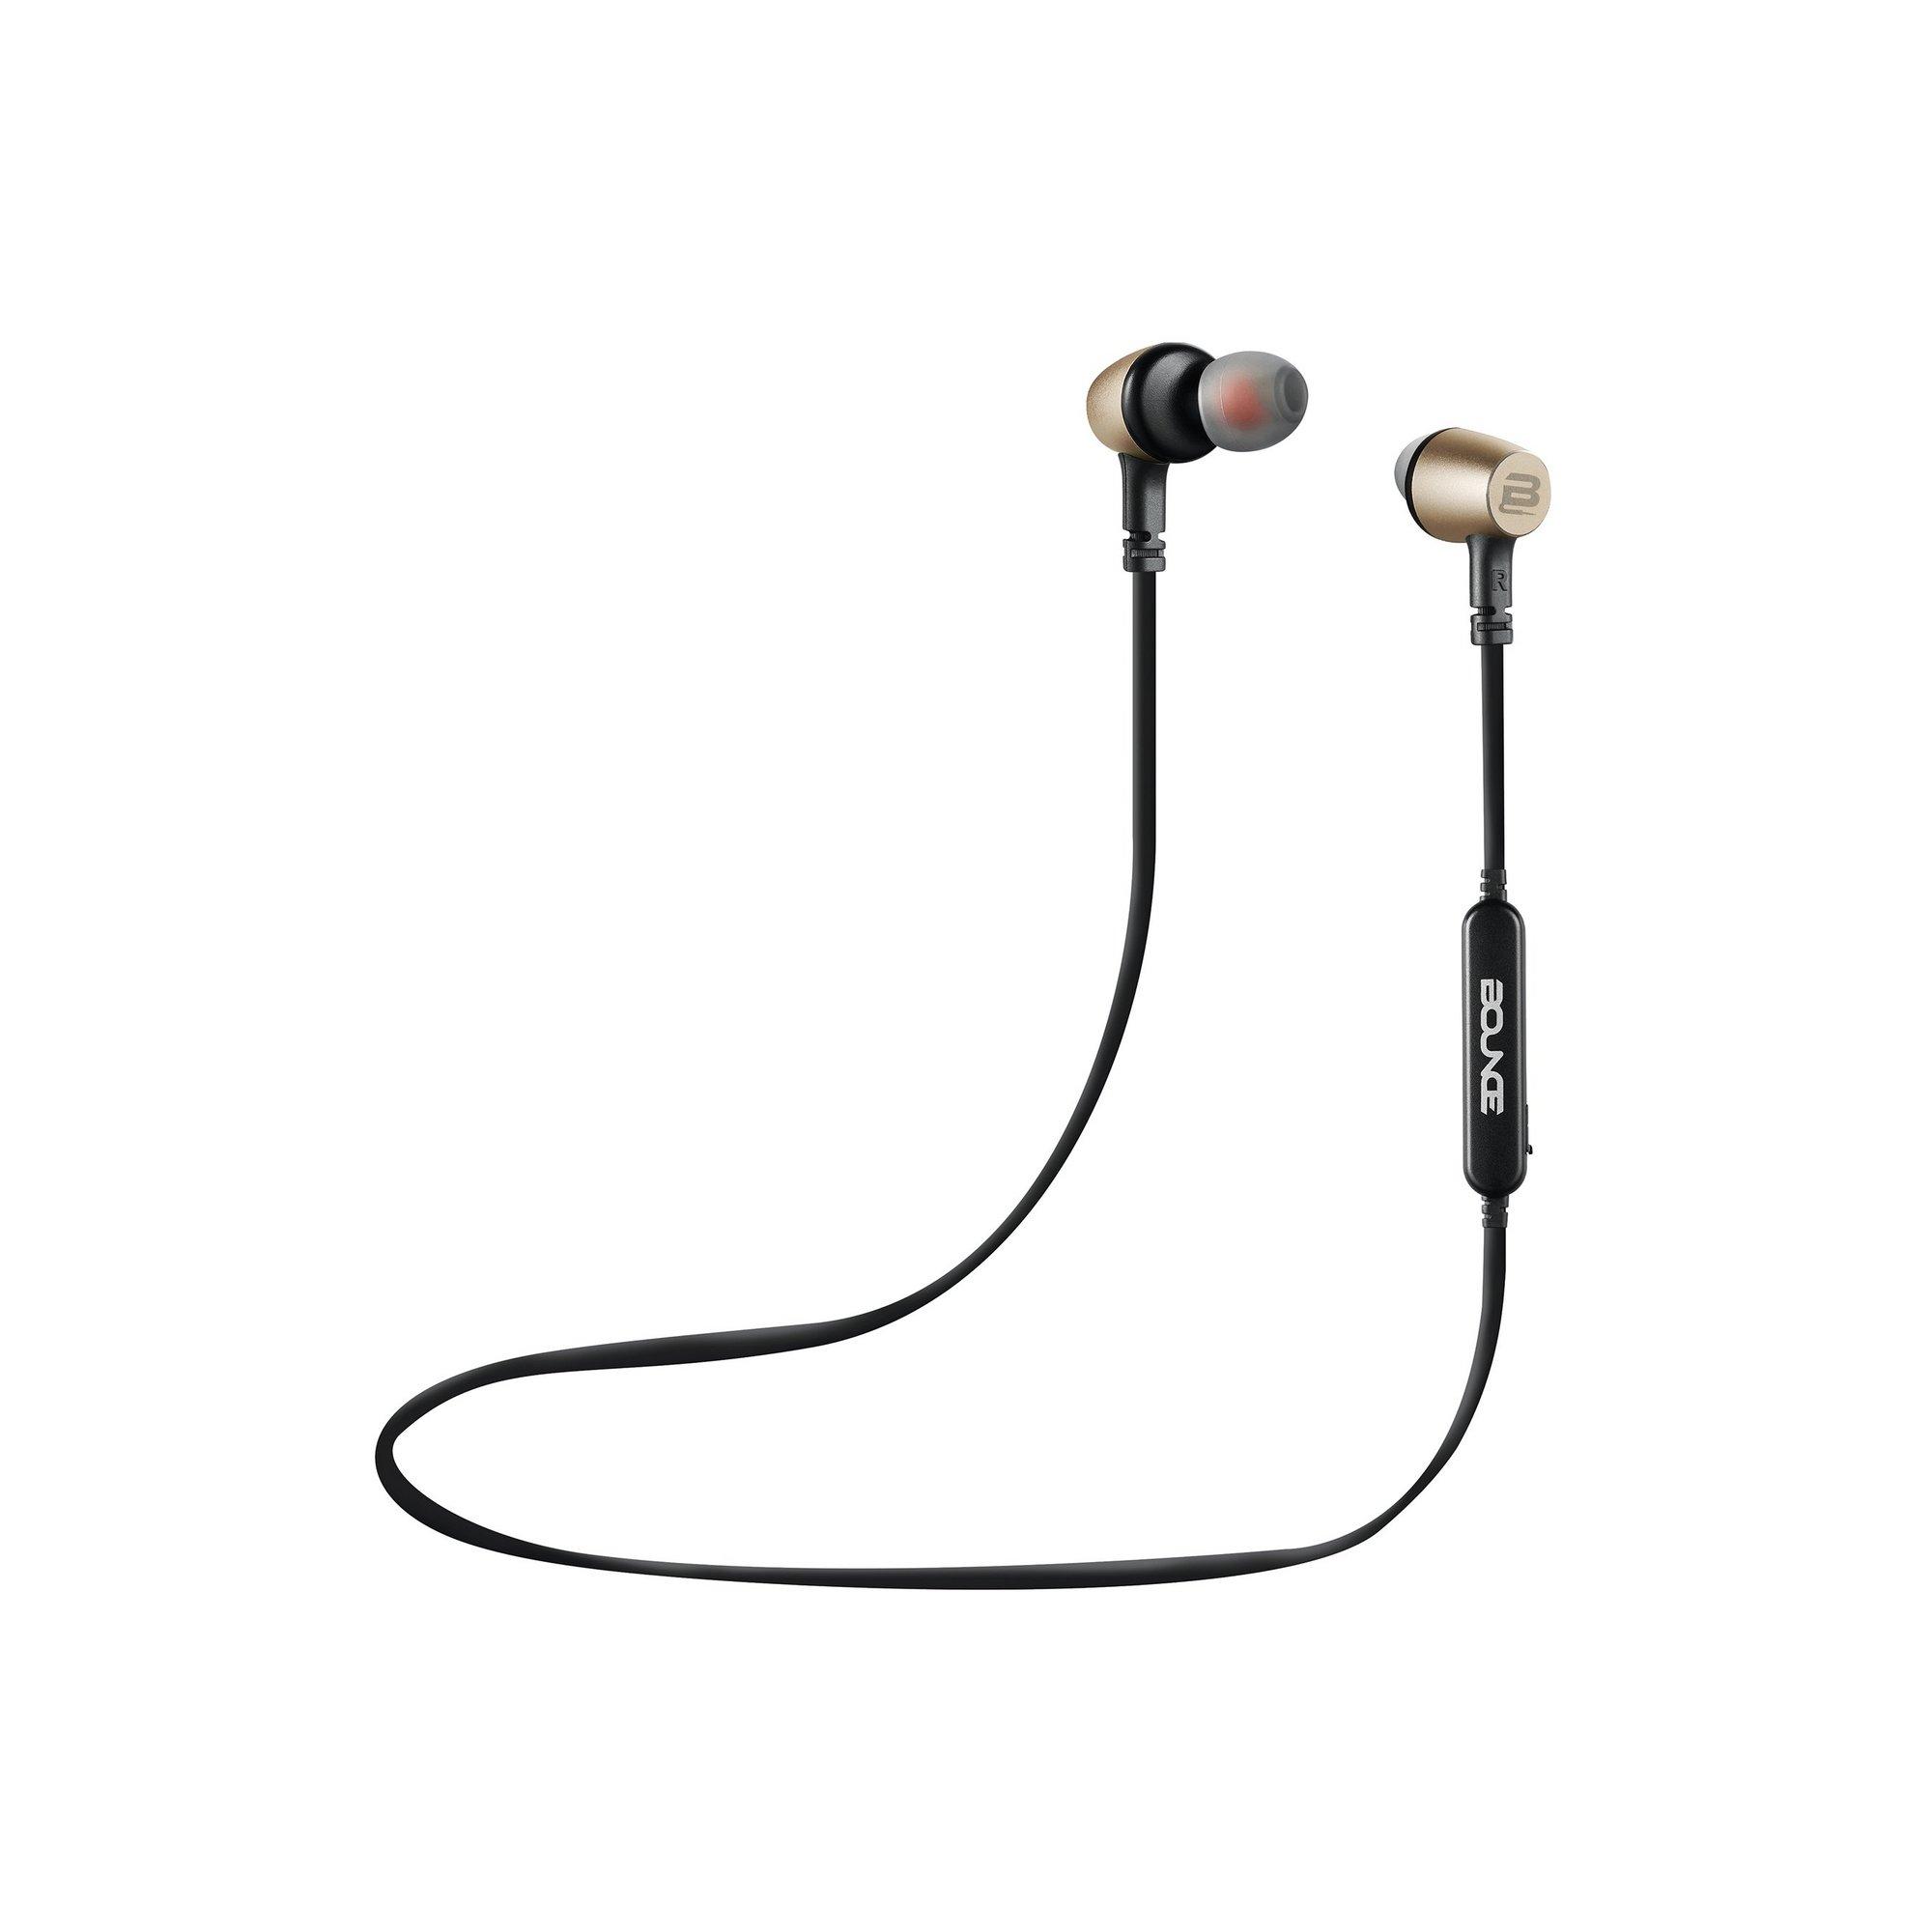 Image of Bounce Tango 2.0 Series Bluetooth Wireless Earphones